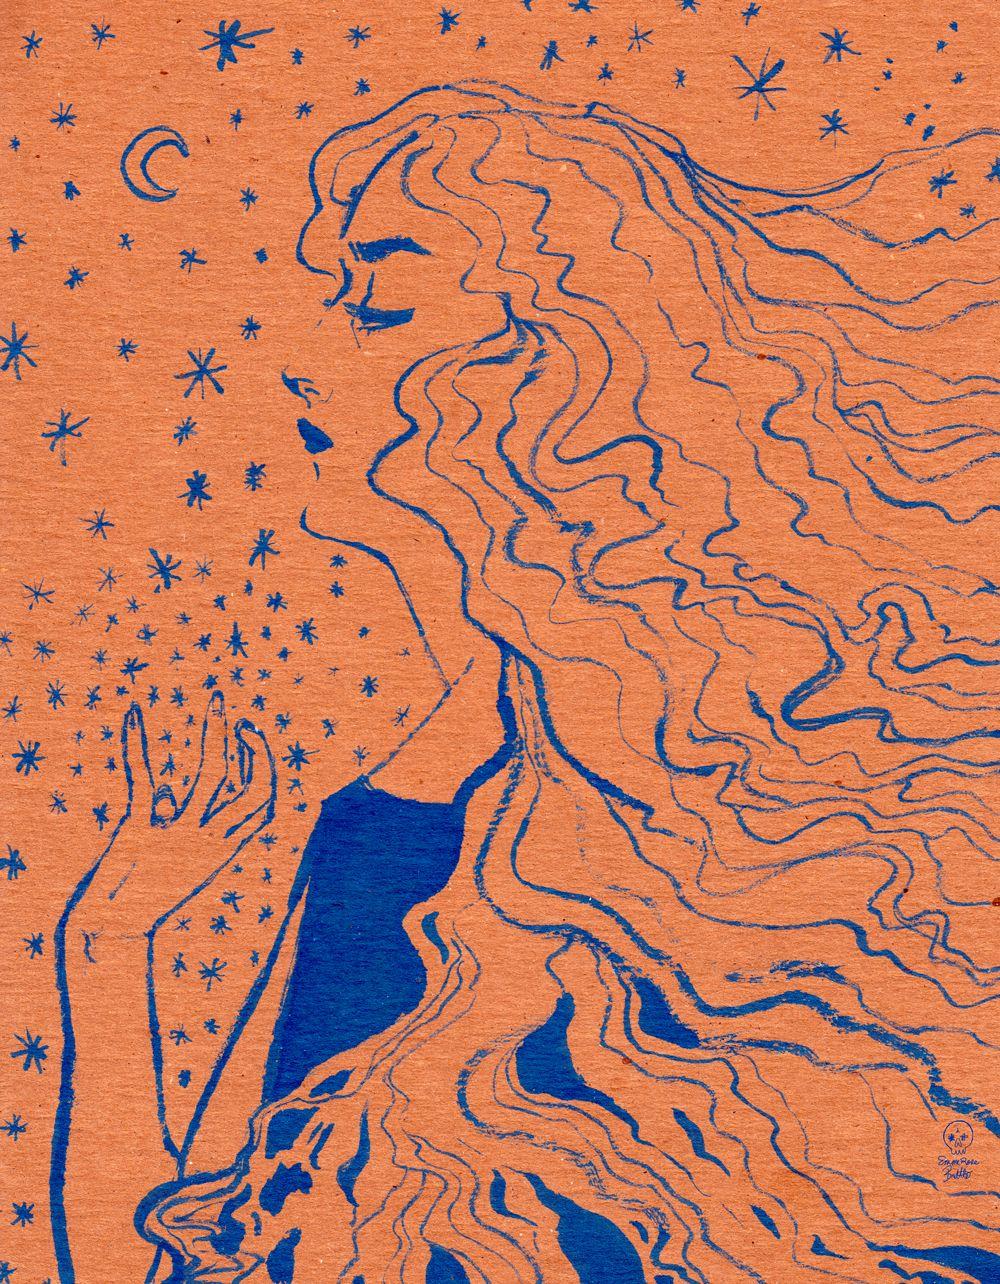 Kraft Prince, an art print by Emme Brettle